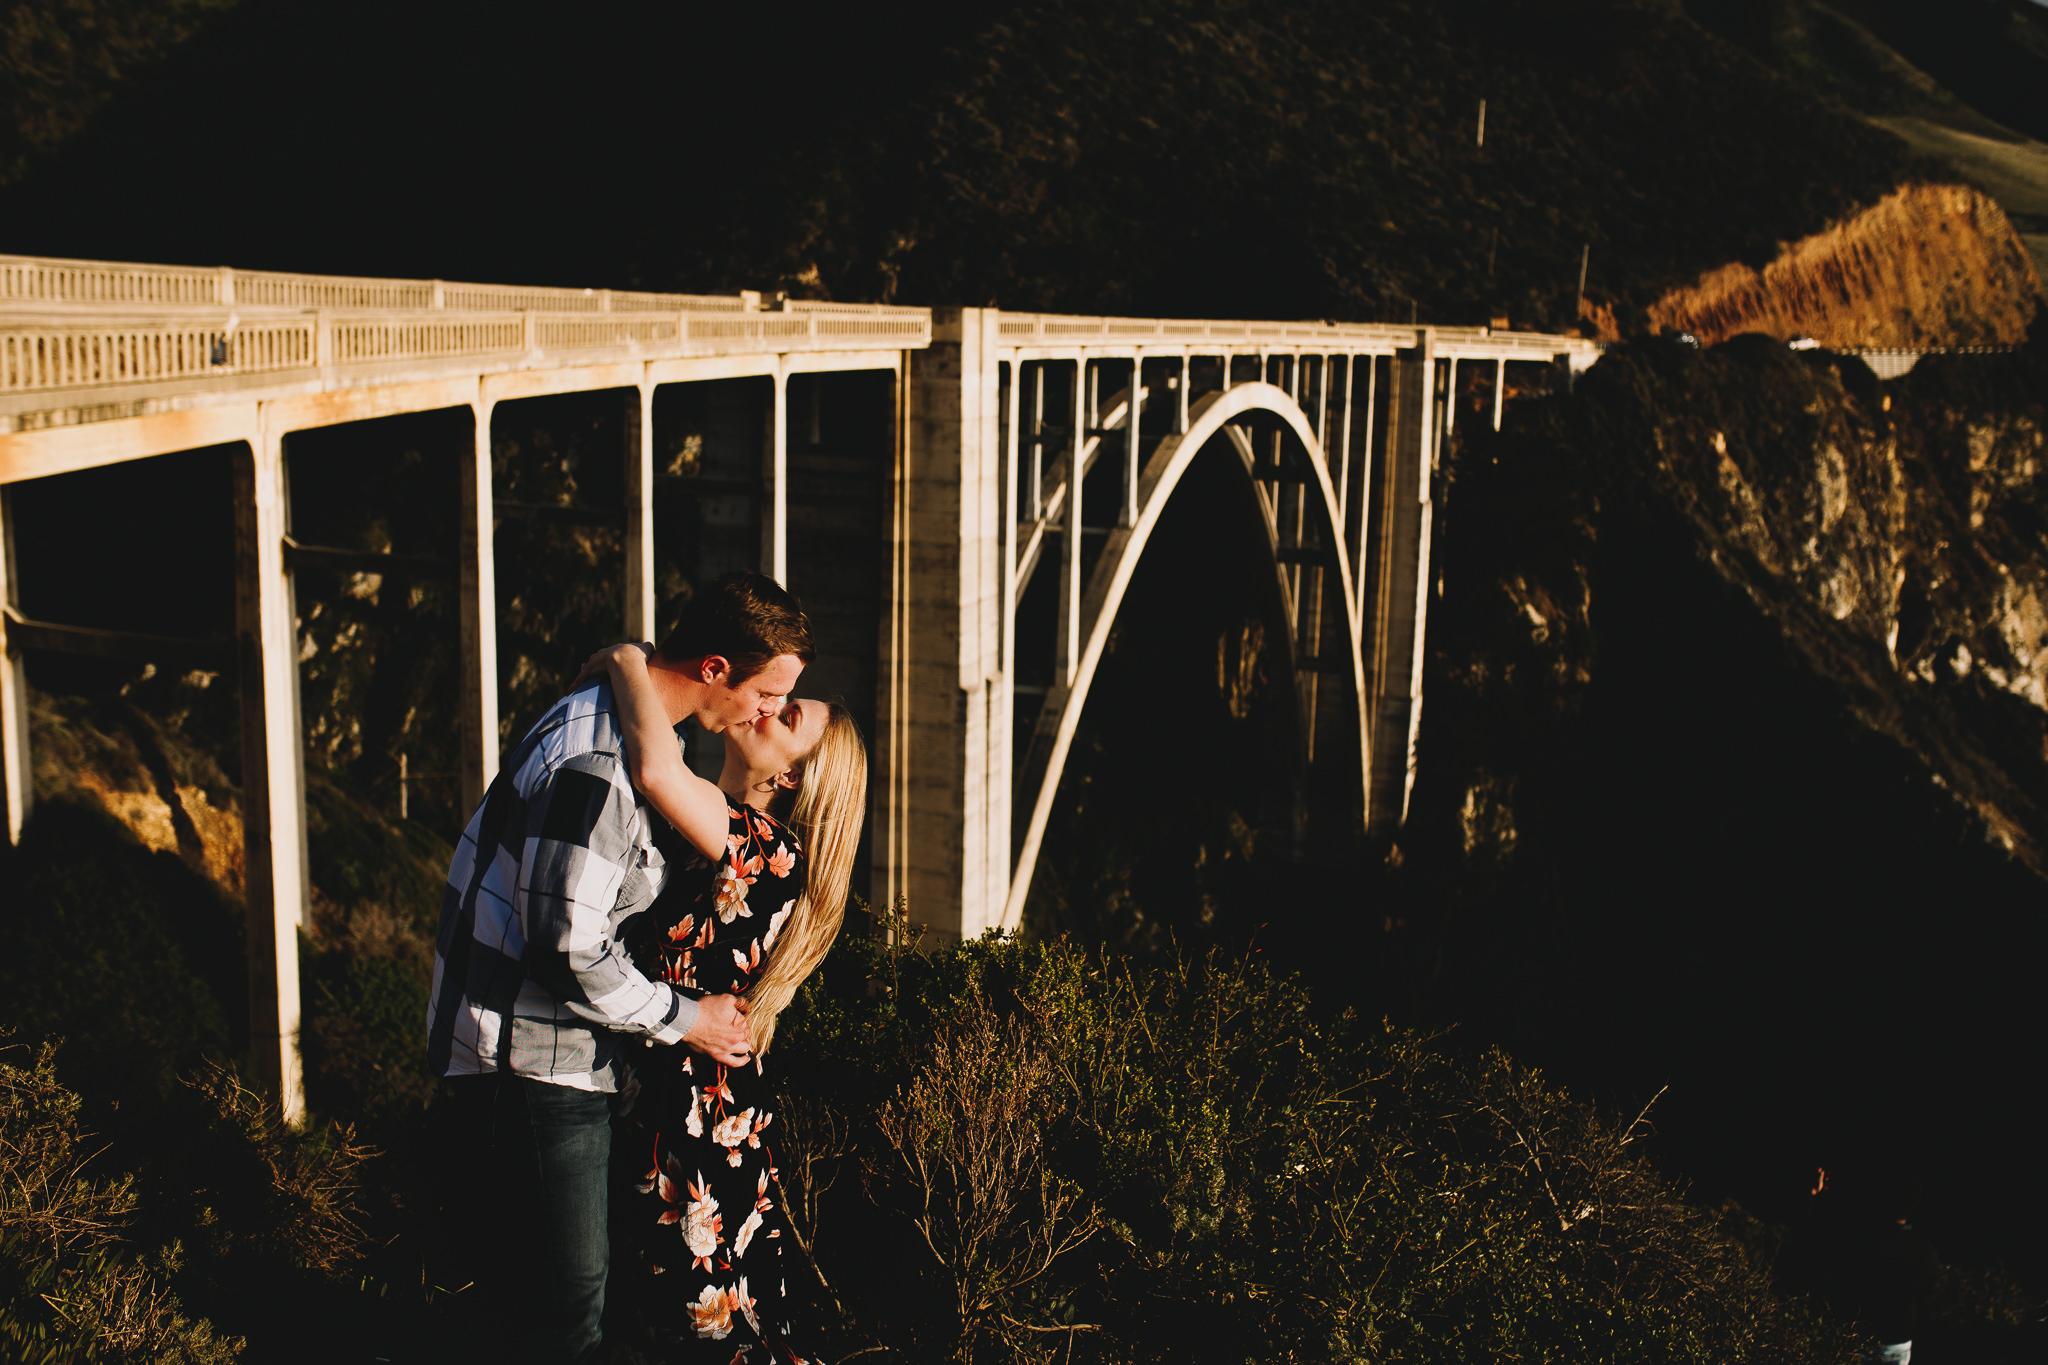 Archer Inspired Photography Michelle JJ Big Sur Wedding Engagement California Central Coast Lifestyle Documentary Photographer-38.jpg